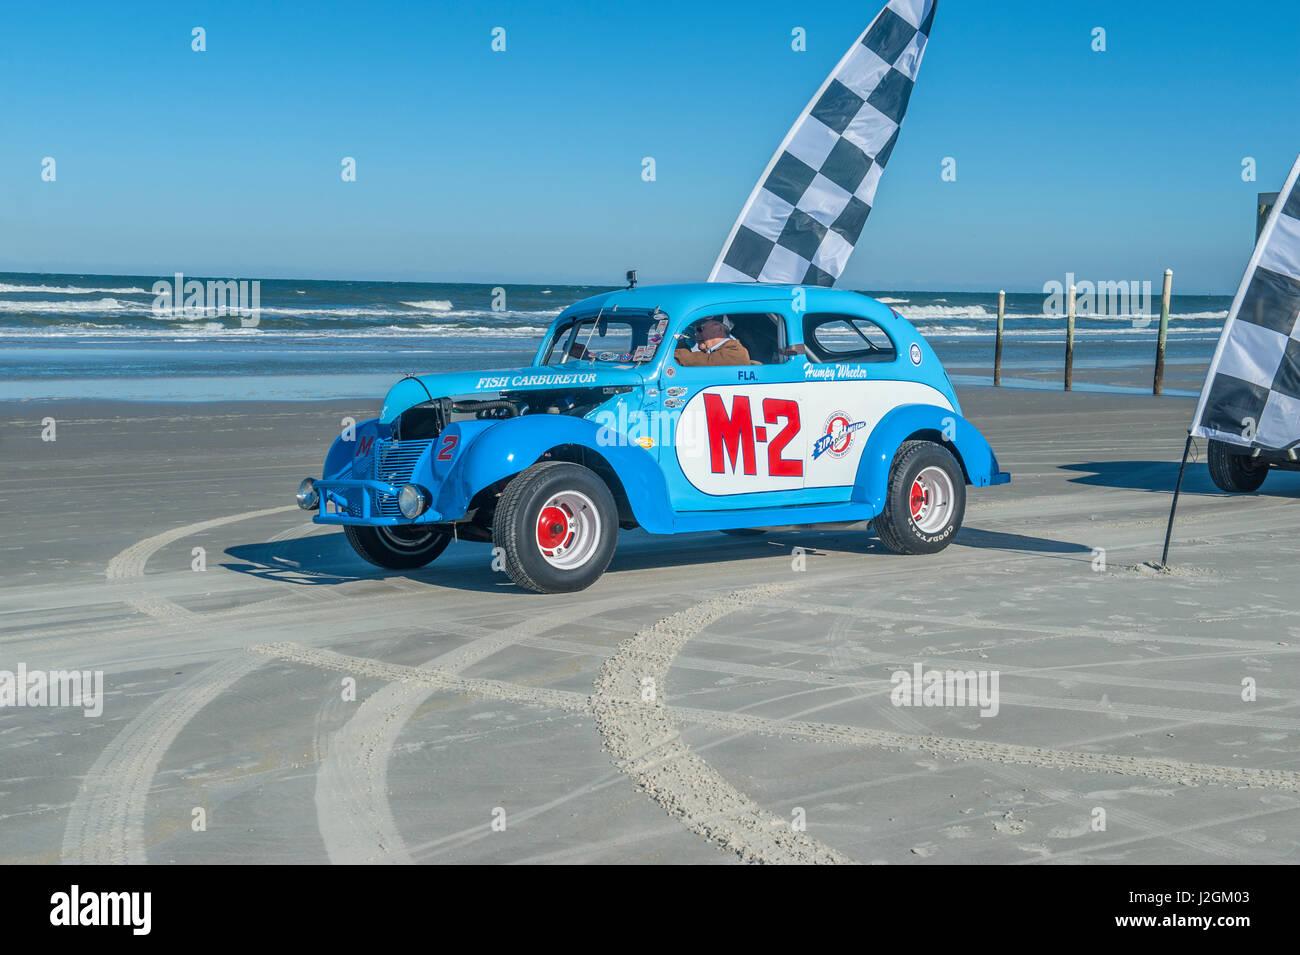 Antique NASCAR car, North Turn, Ponce Inlet, Florida, USA - Stock-Bilder